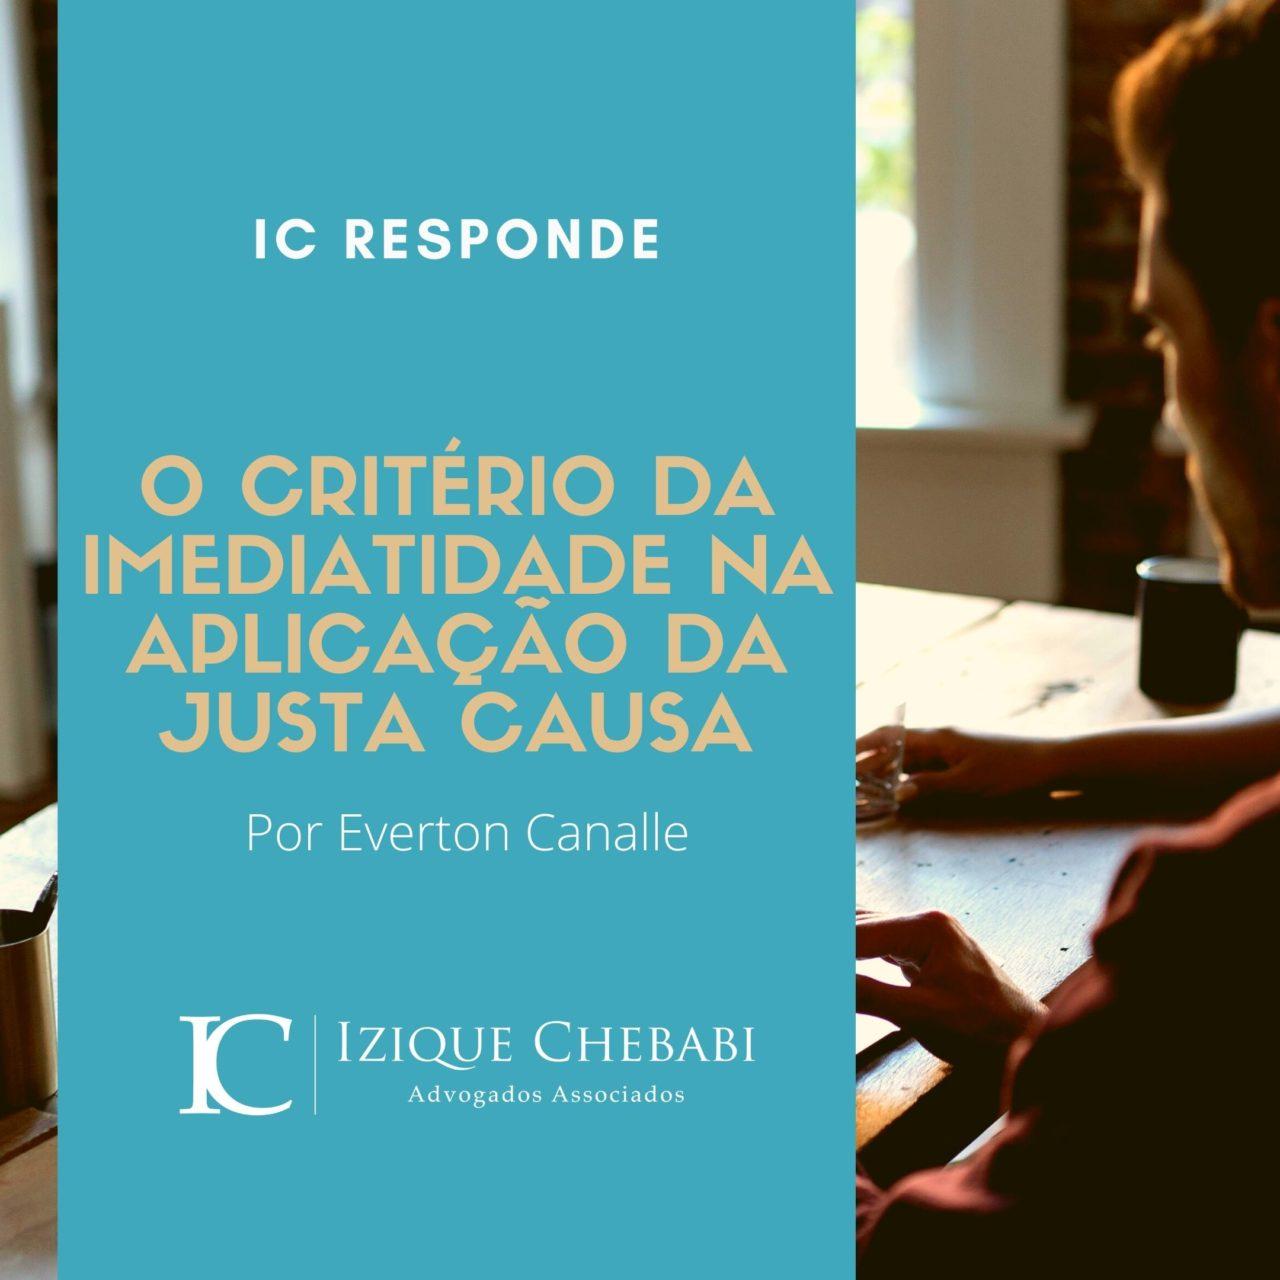 https://chebabi.com/wp-content/uploads/2021/09/Copia-de-Copia-de-Turquesa-Viagem-Instagram-Post-1-1280x1280.jpg